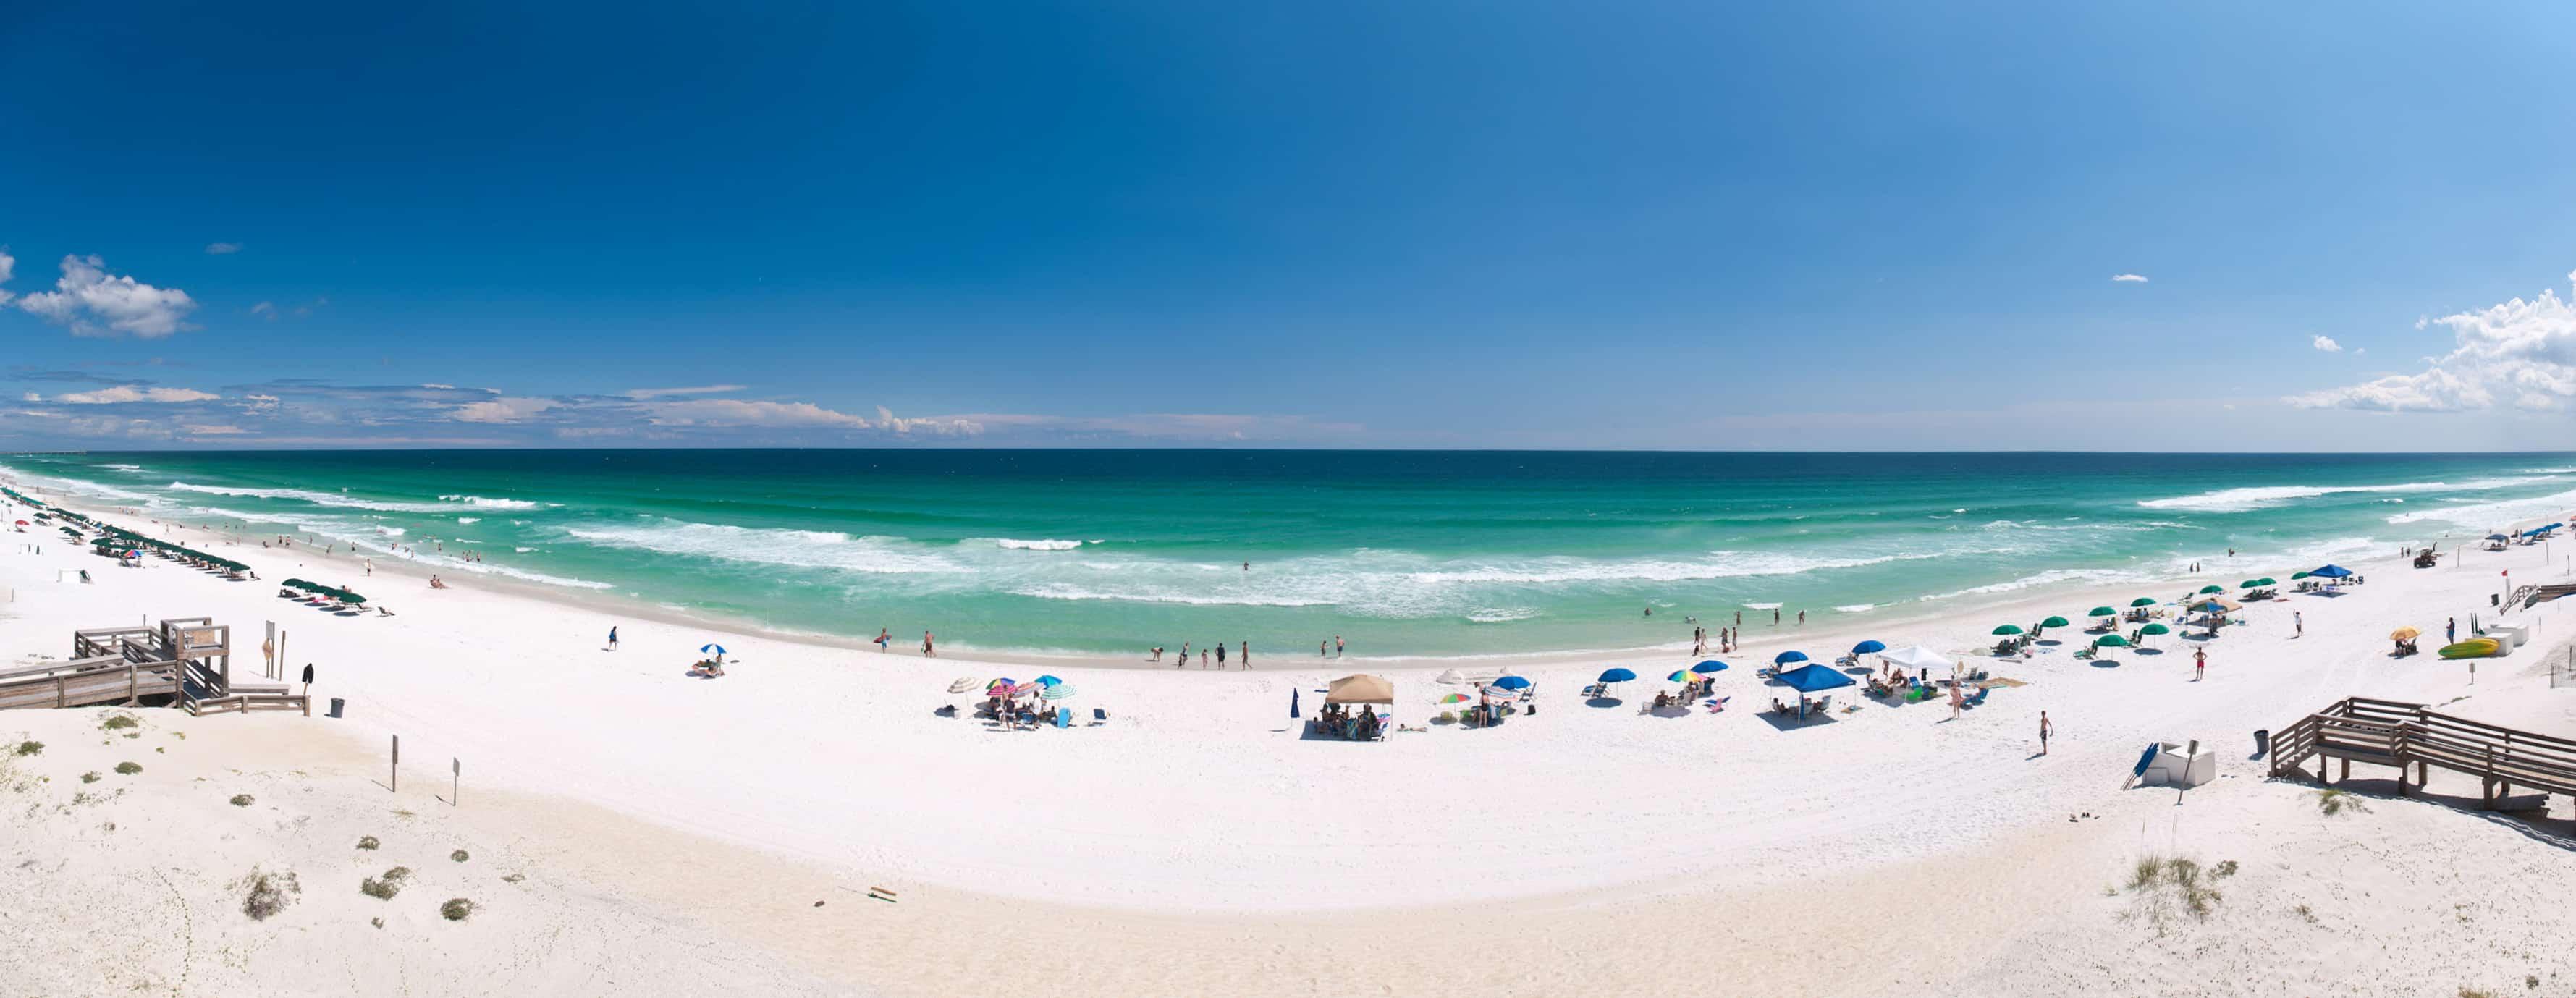 Fall Into Florida S Emerald Coast This